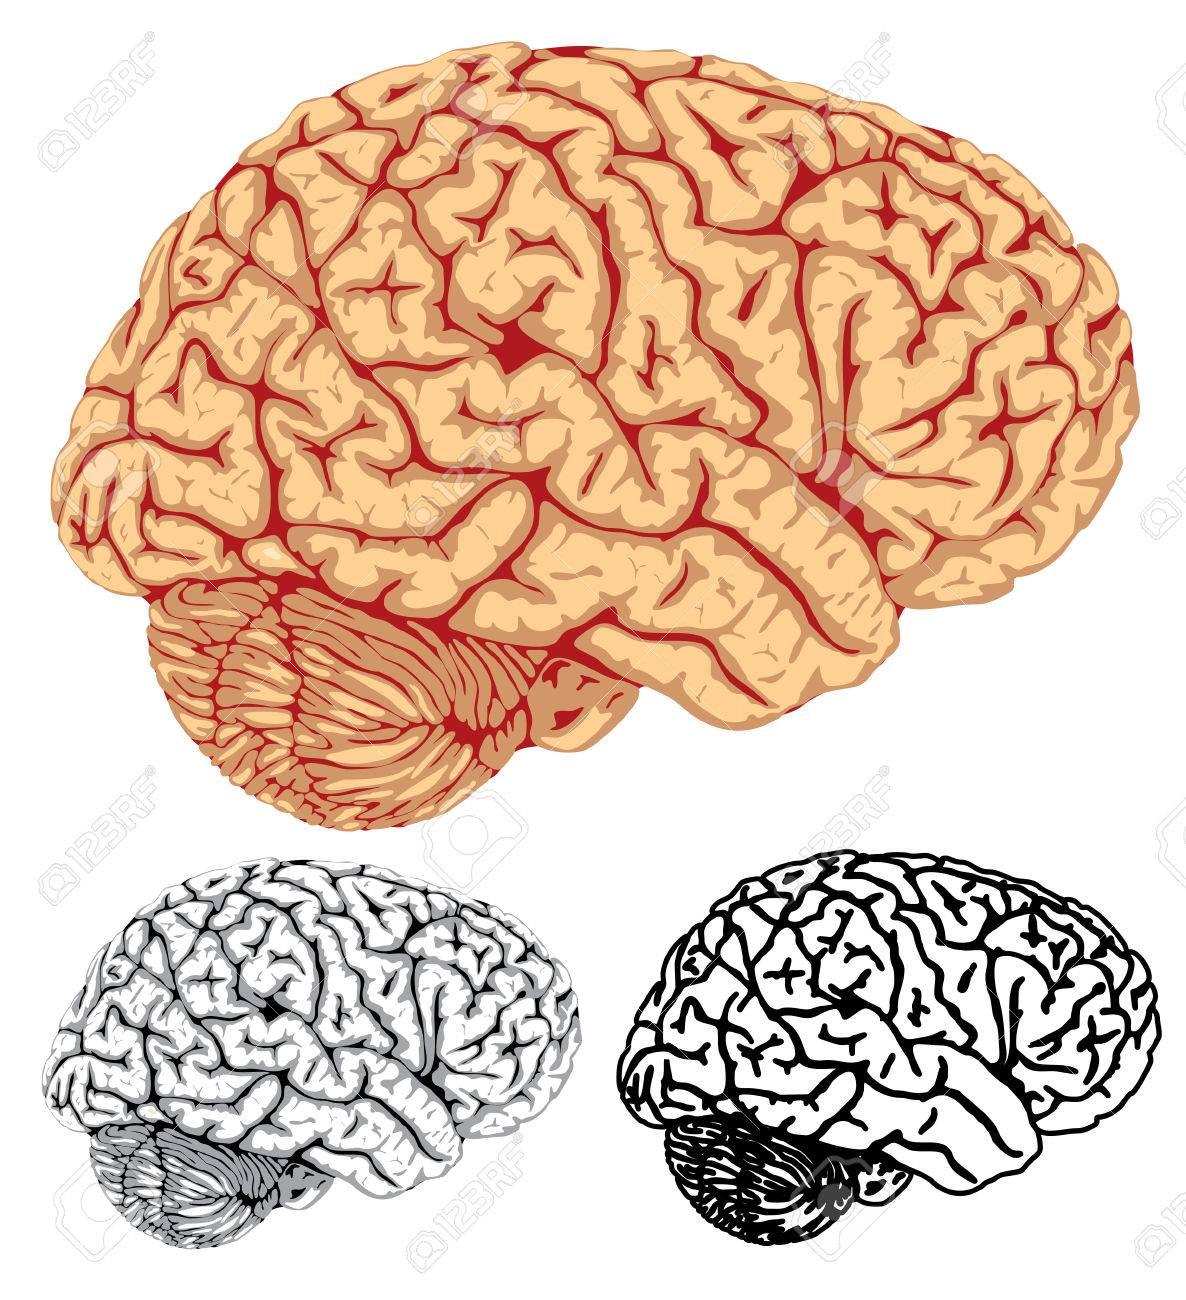 Vector. Human brain Stock Vector - 2750438